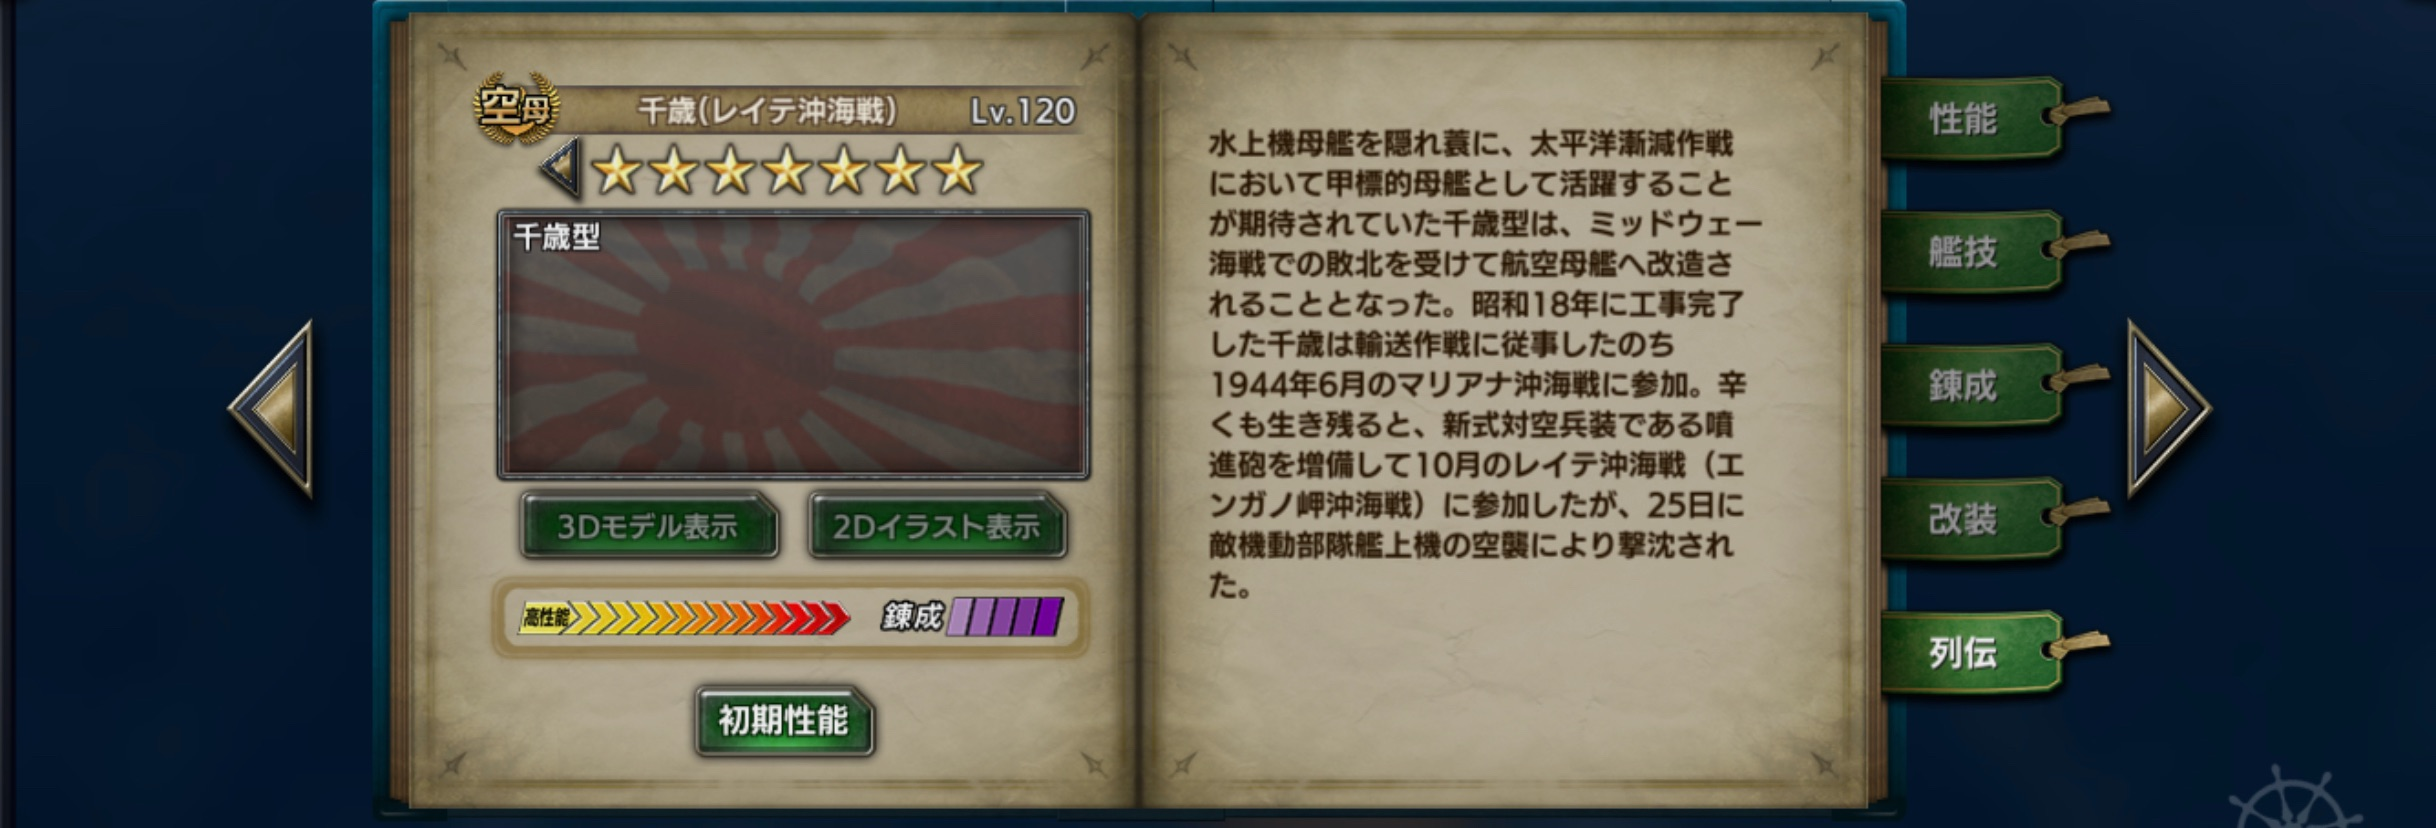 ChitoseL-history